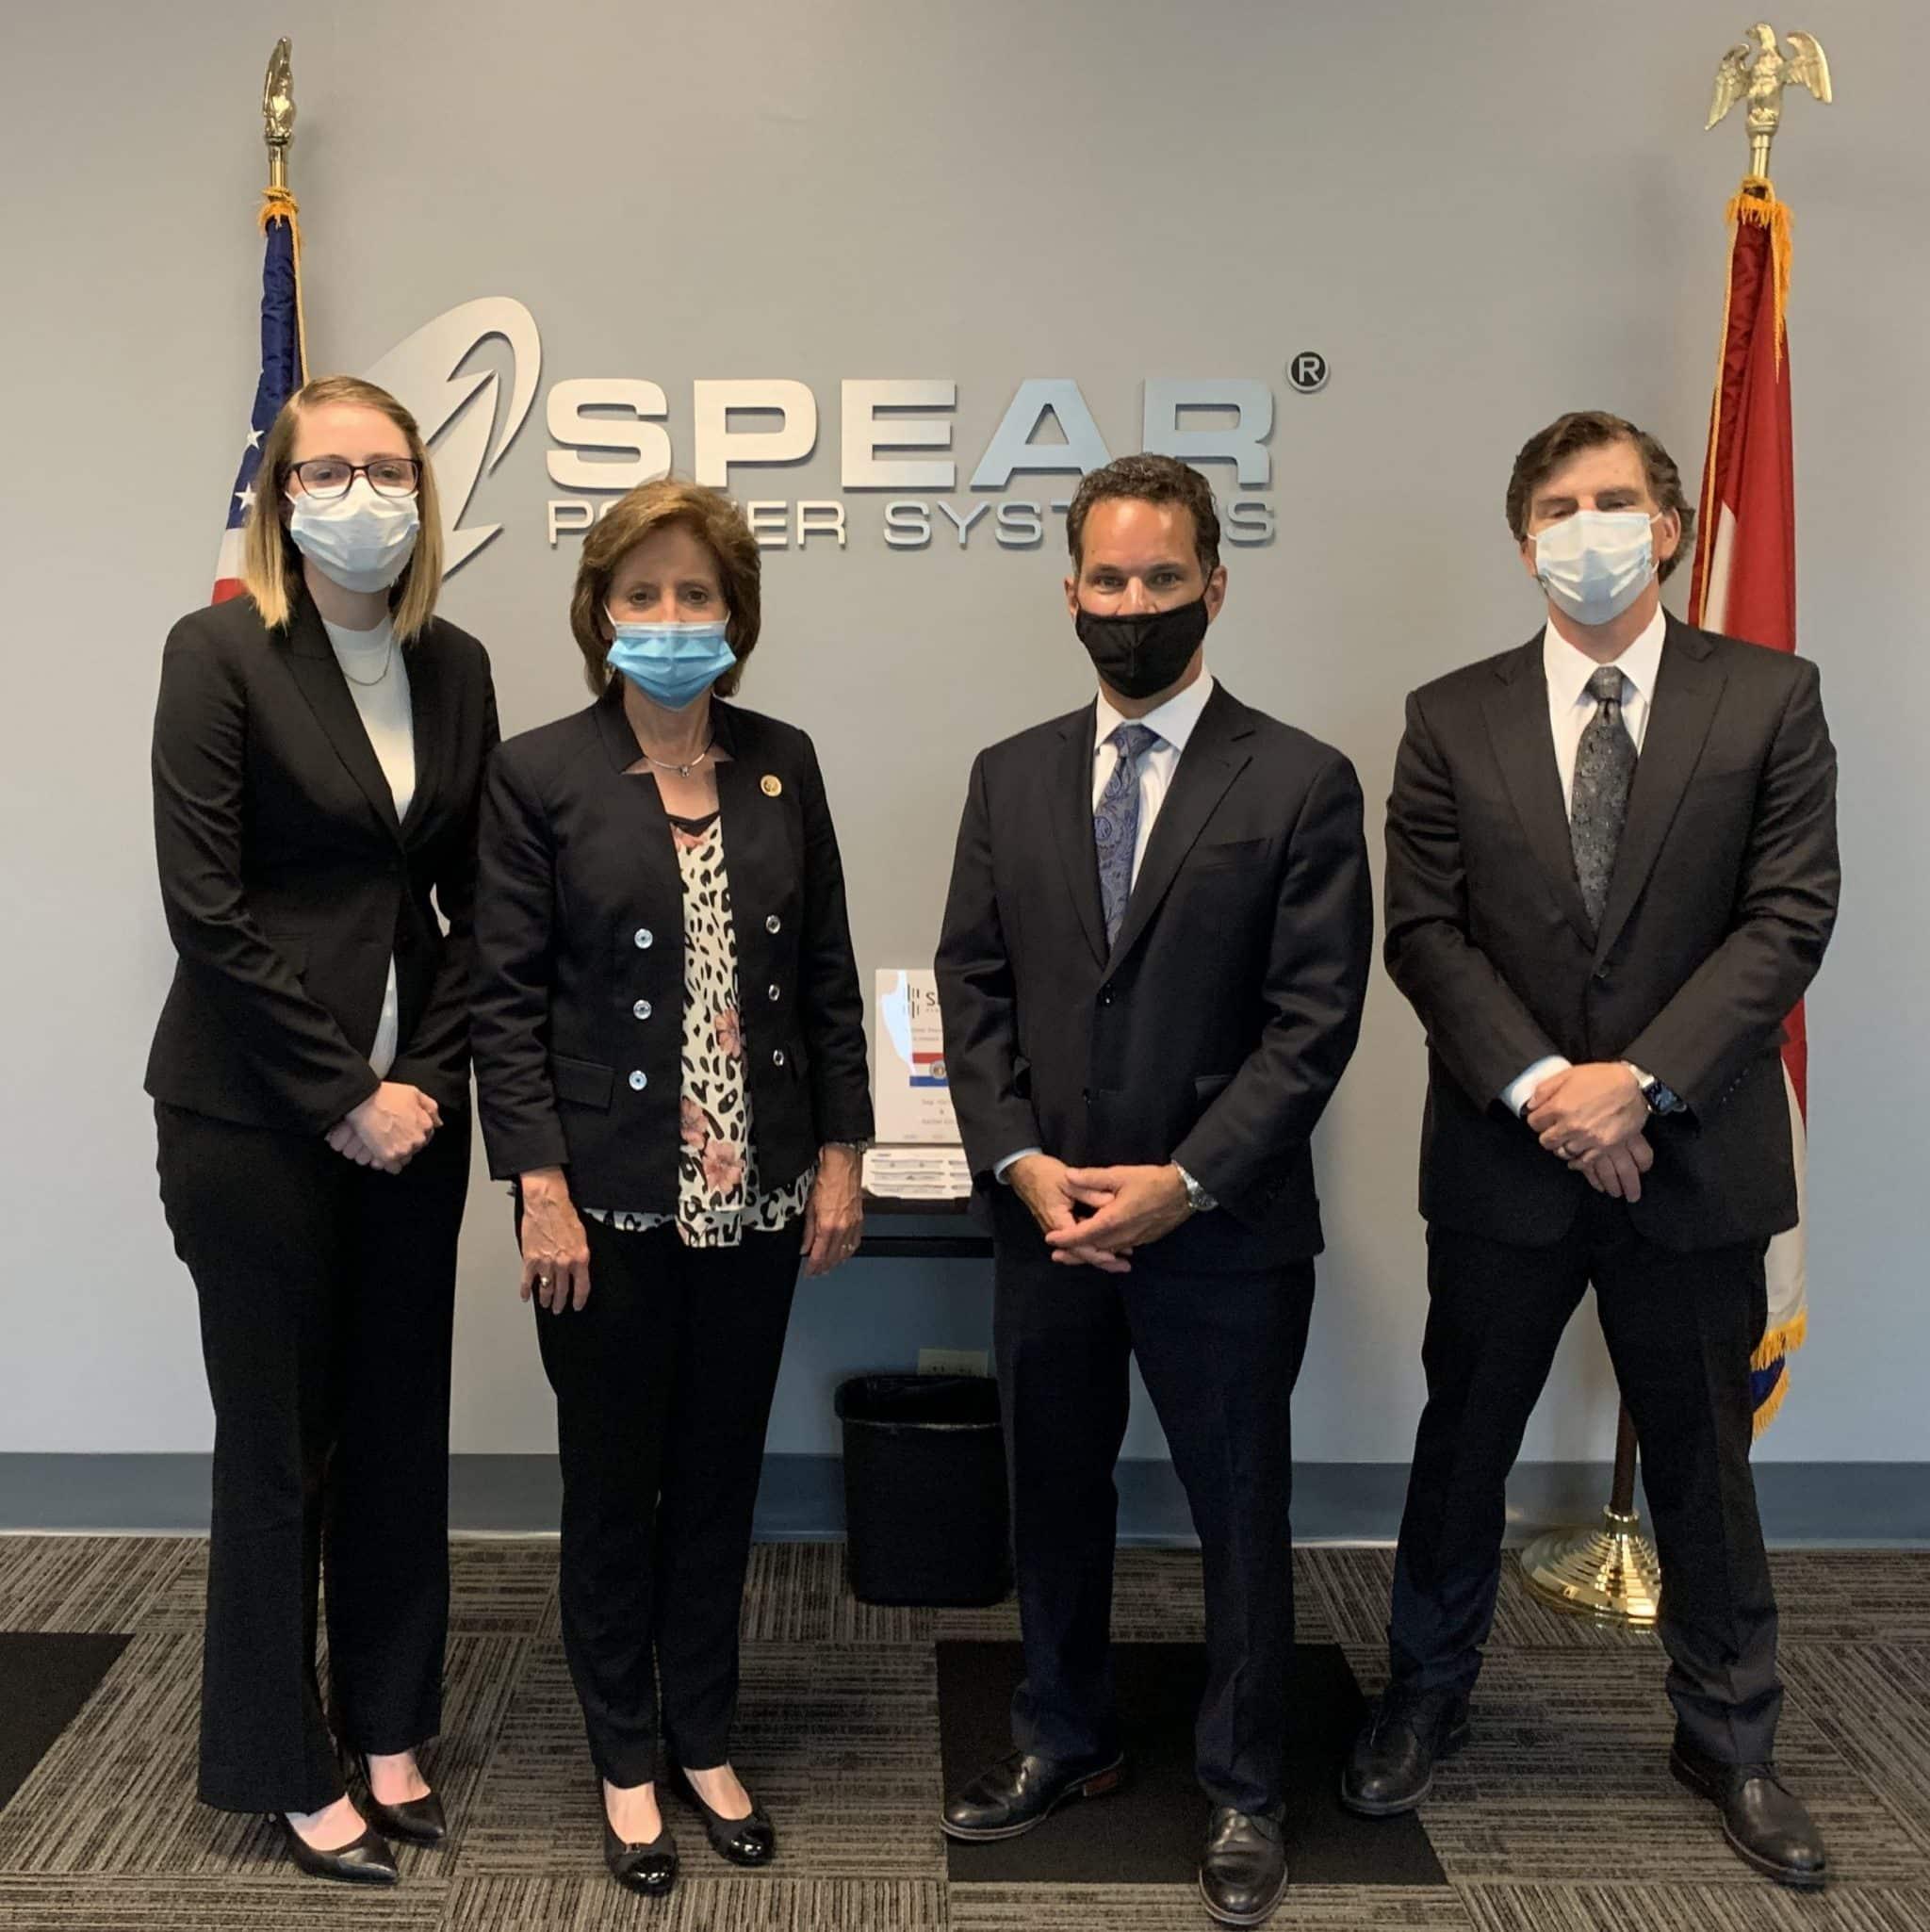 hartzler visit with masks